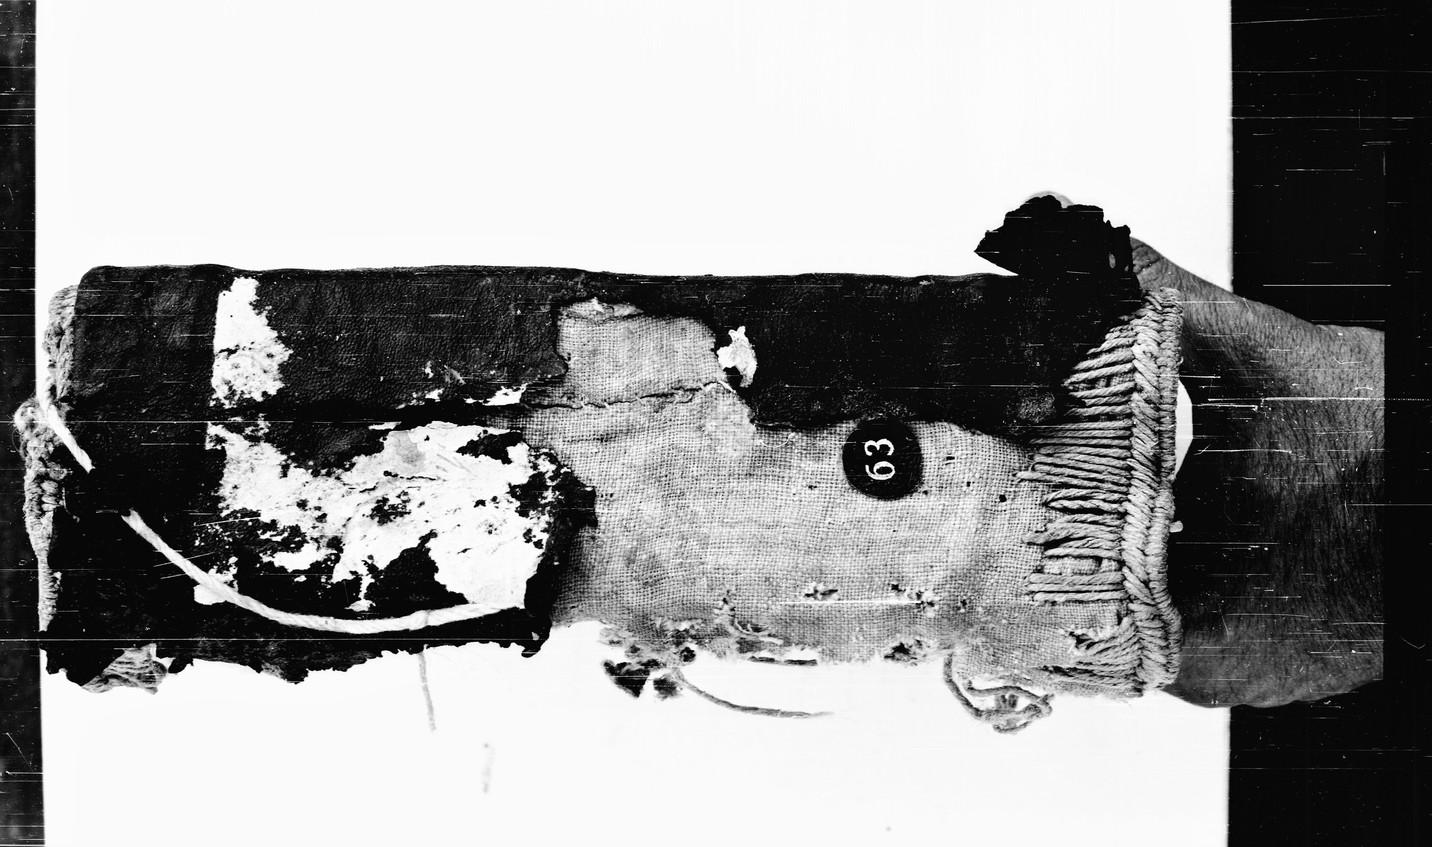 Amorgos_MS_63_spine_horizontally_